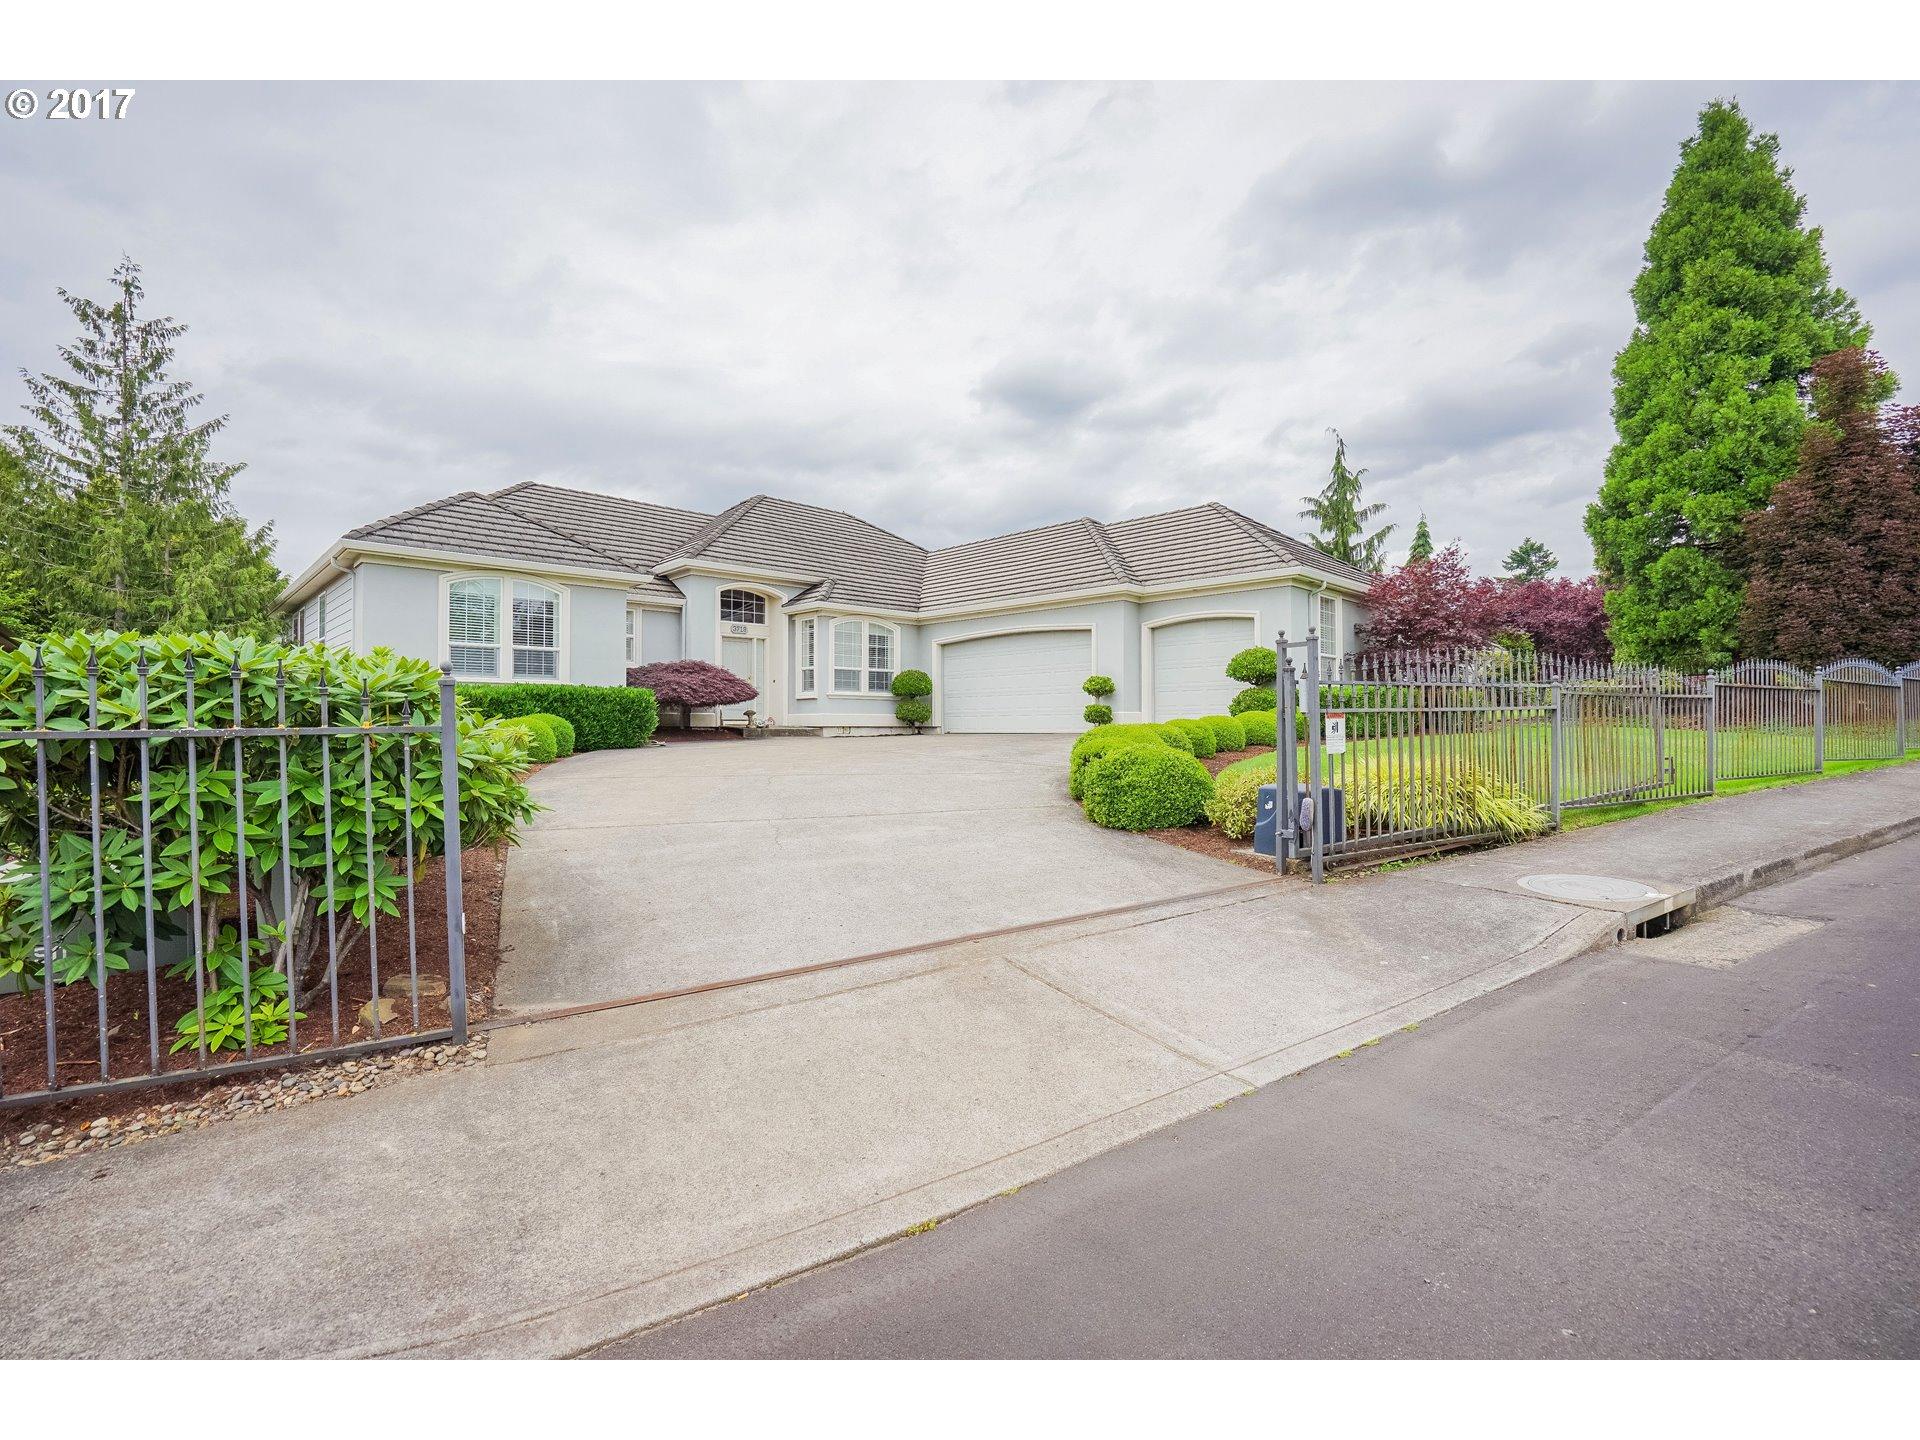 3718 SE 155TH AVE, Vancouver, WA 98683